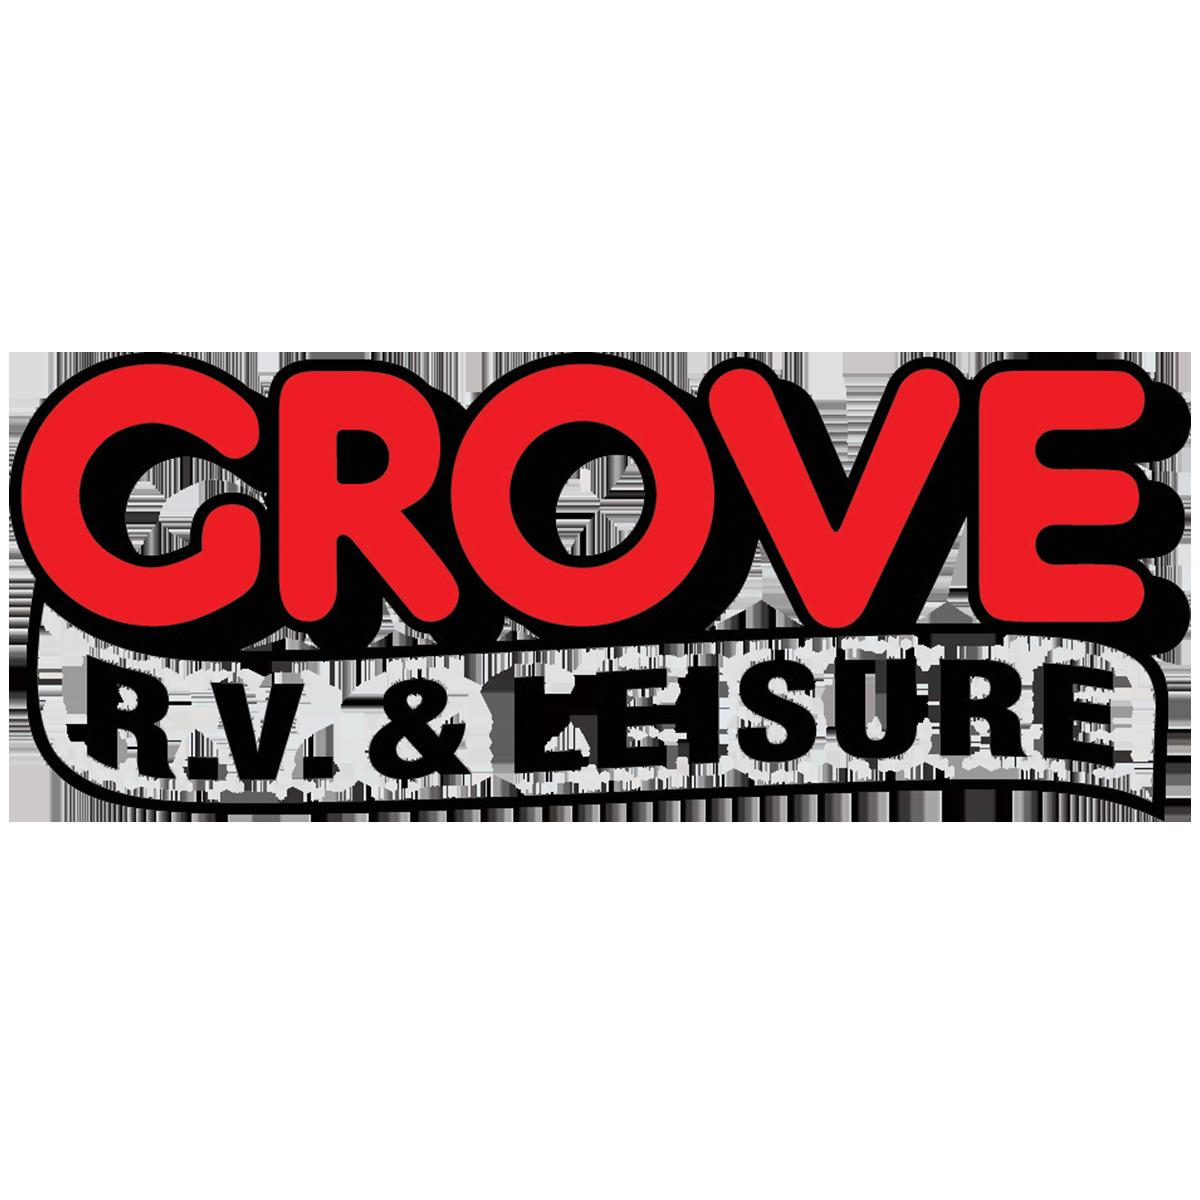 Blueberry Bluegrass Festival - Grove RV